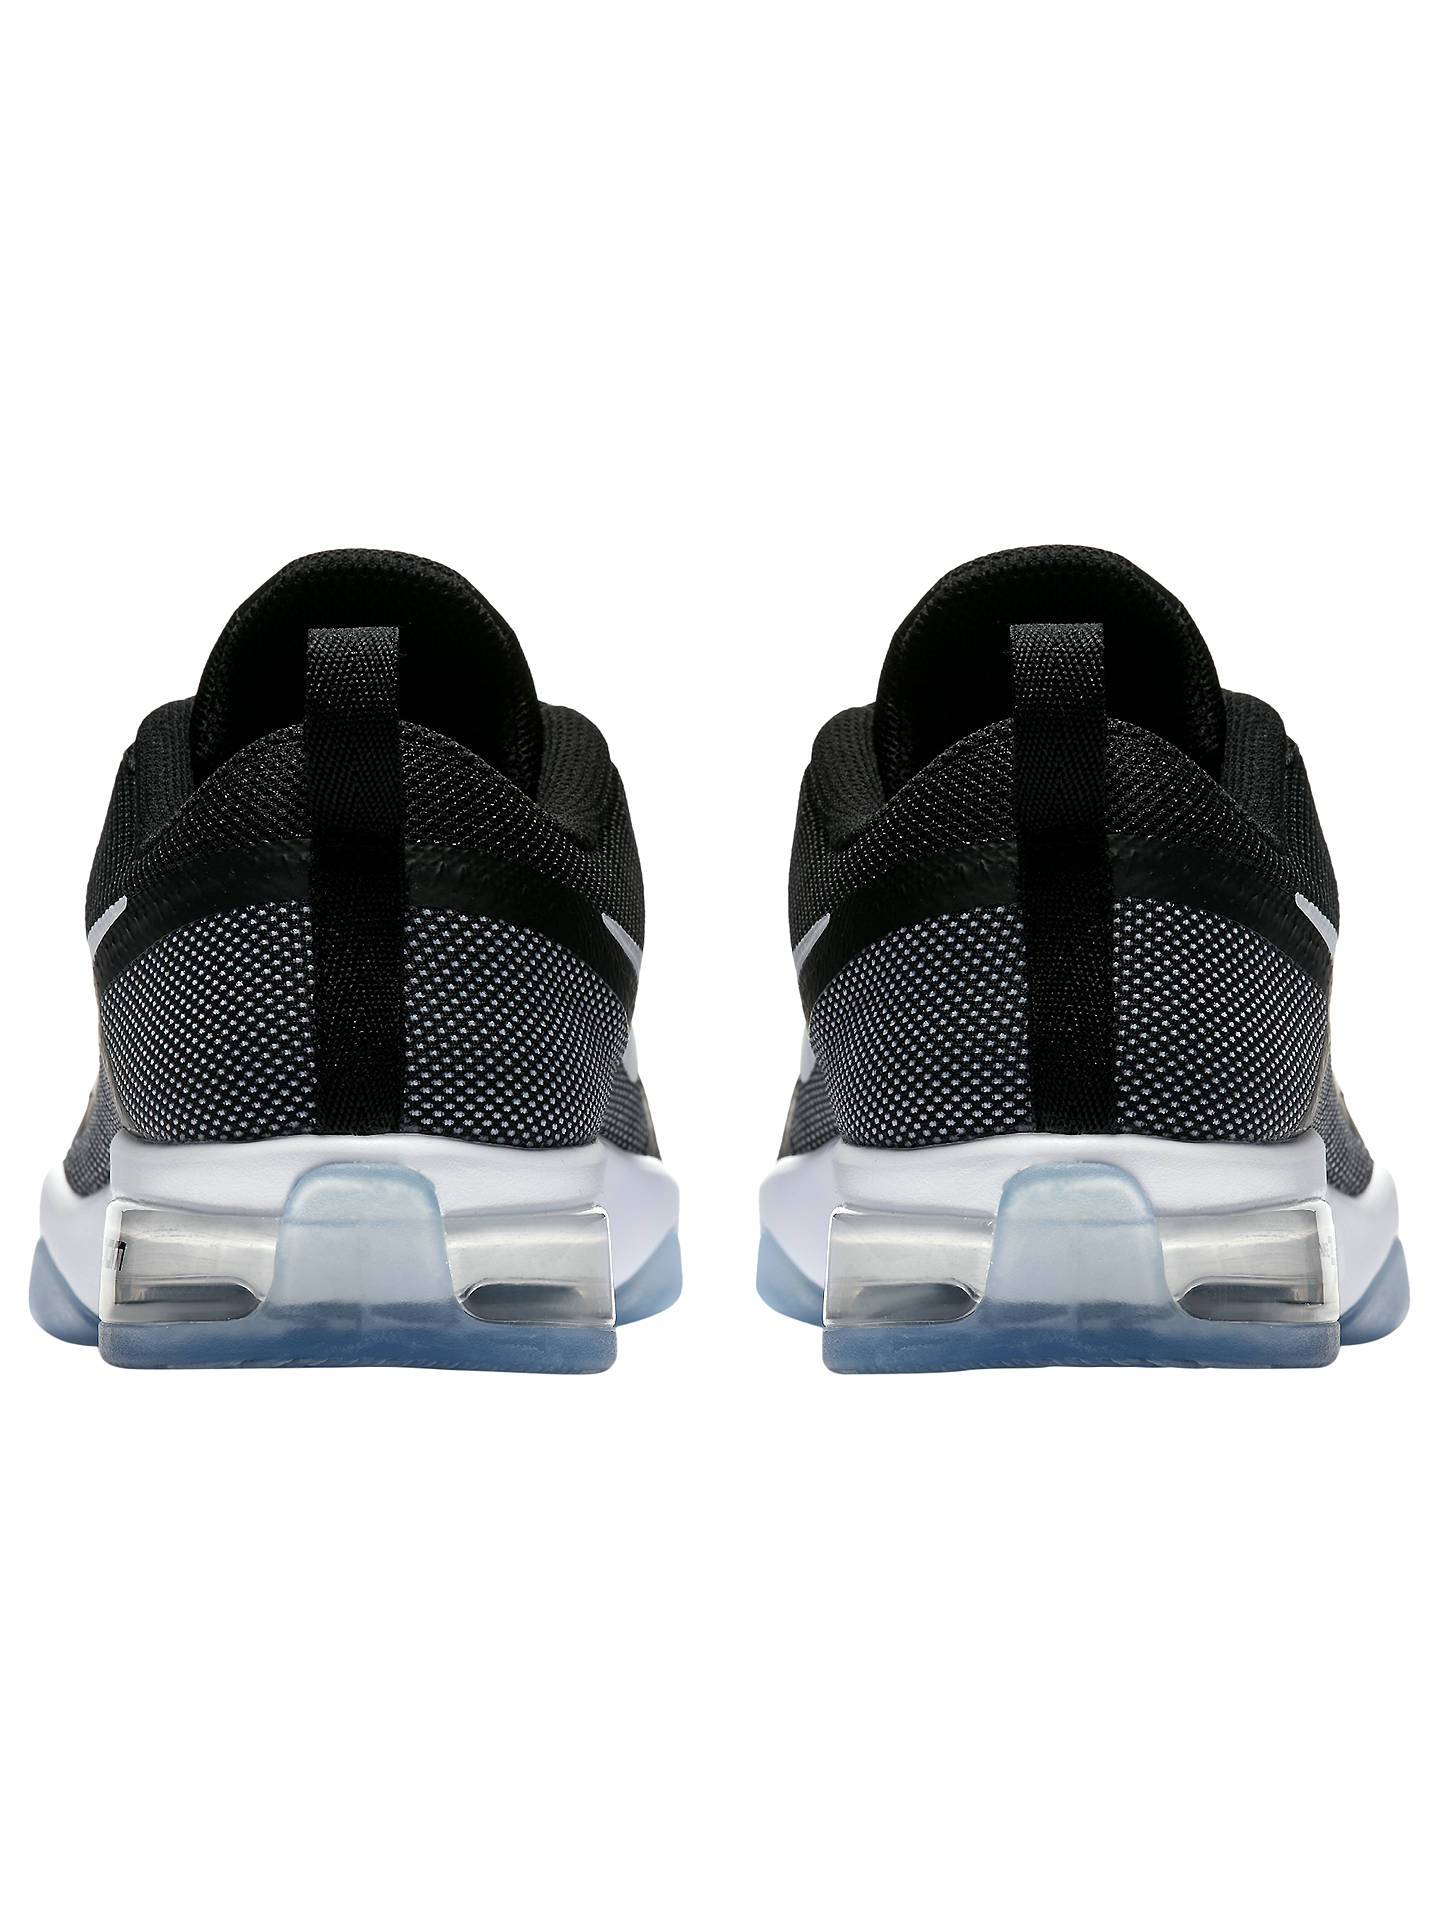 e3a75998559e3 Nike Zoom Fitness Women's Training Shoes, Black at John Lewis & Partners